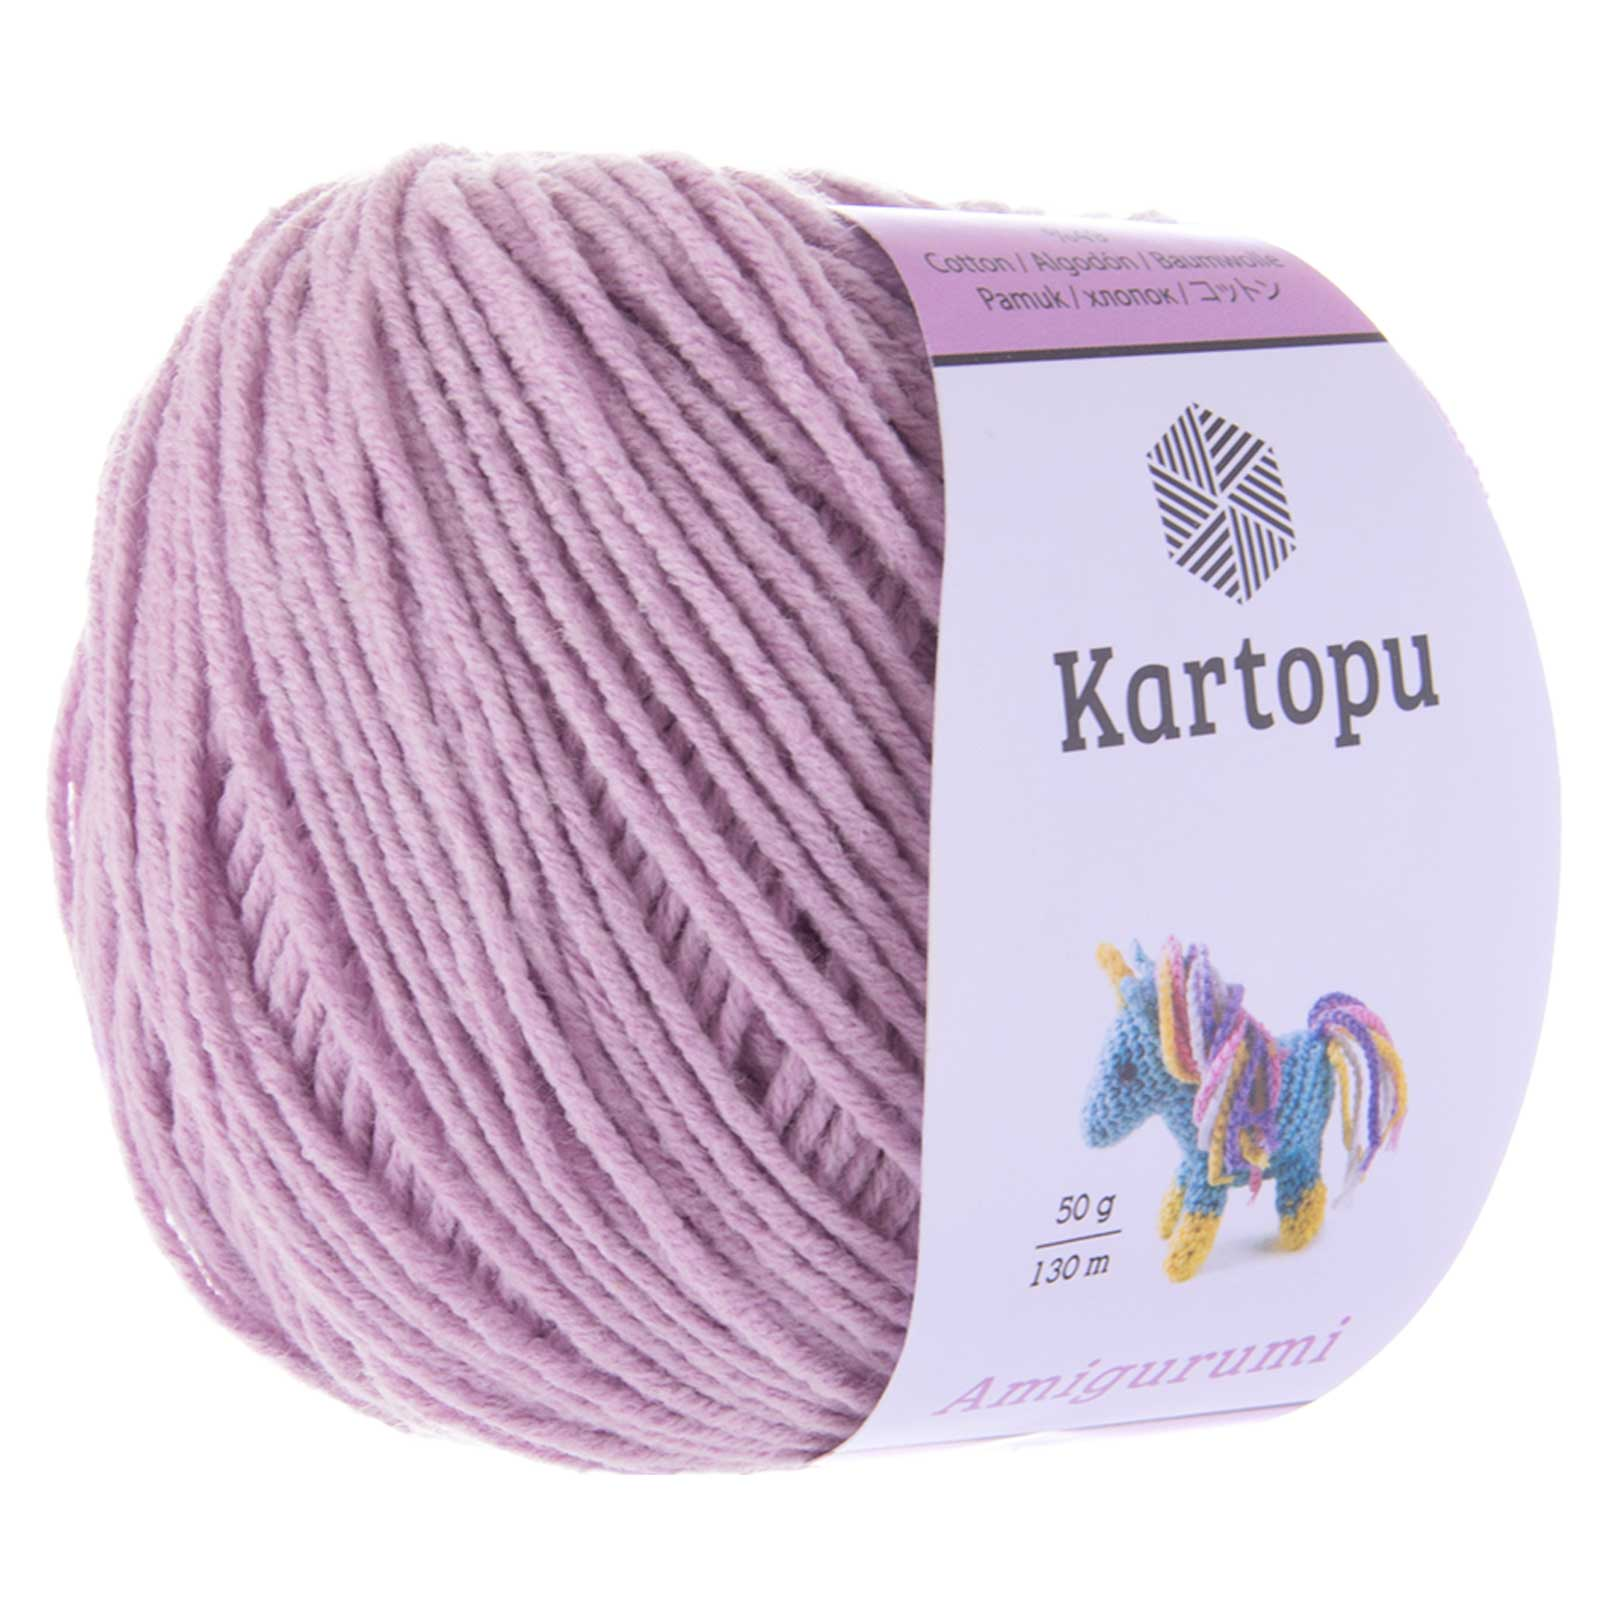 50g Strickgarn Kartopu Amigurumi Strickwolle Häkelgarn Amigurumiwolle, Farbwahl – Bild 12